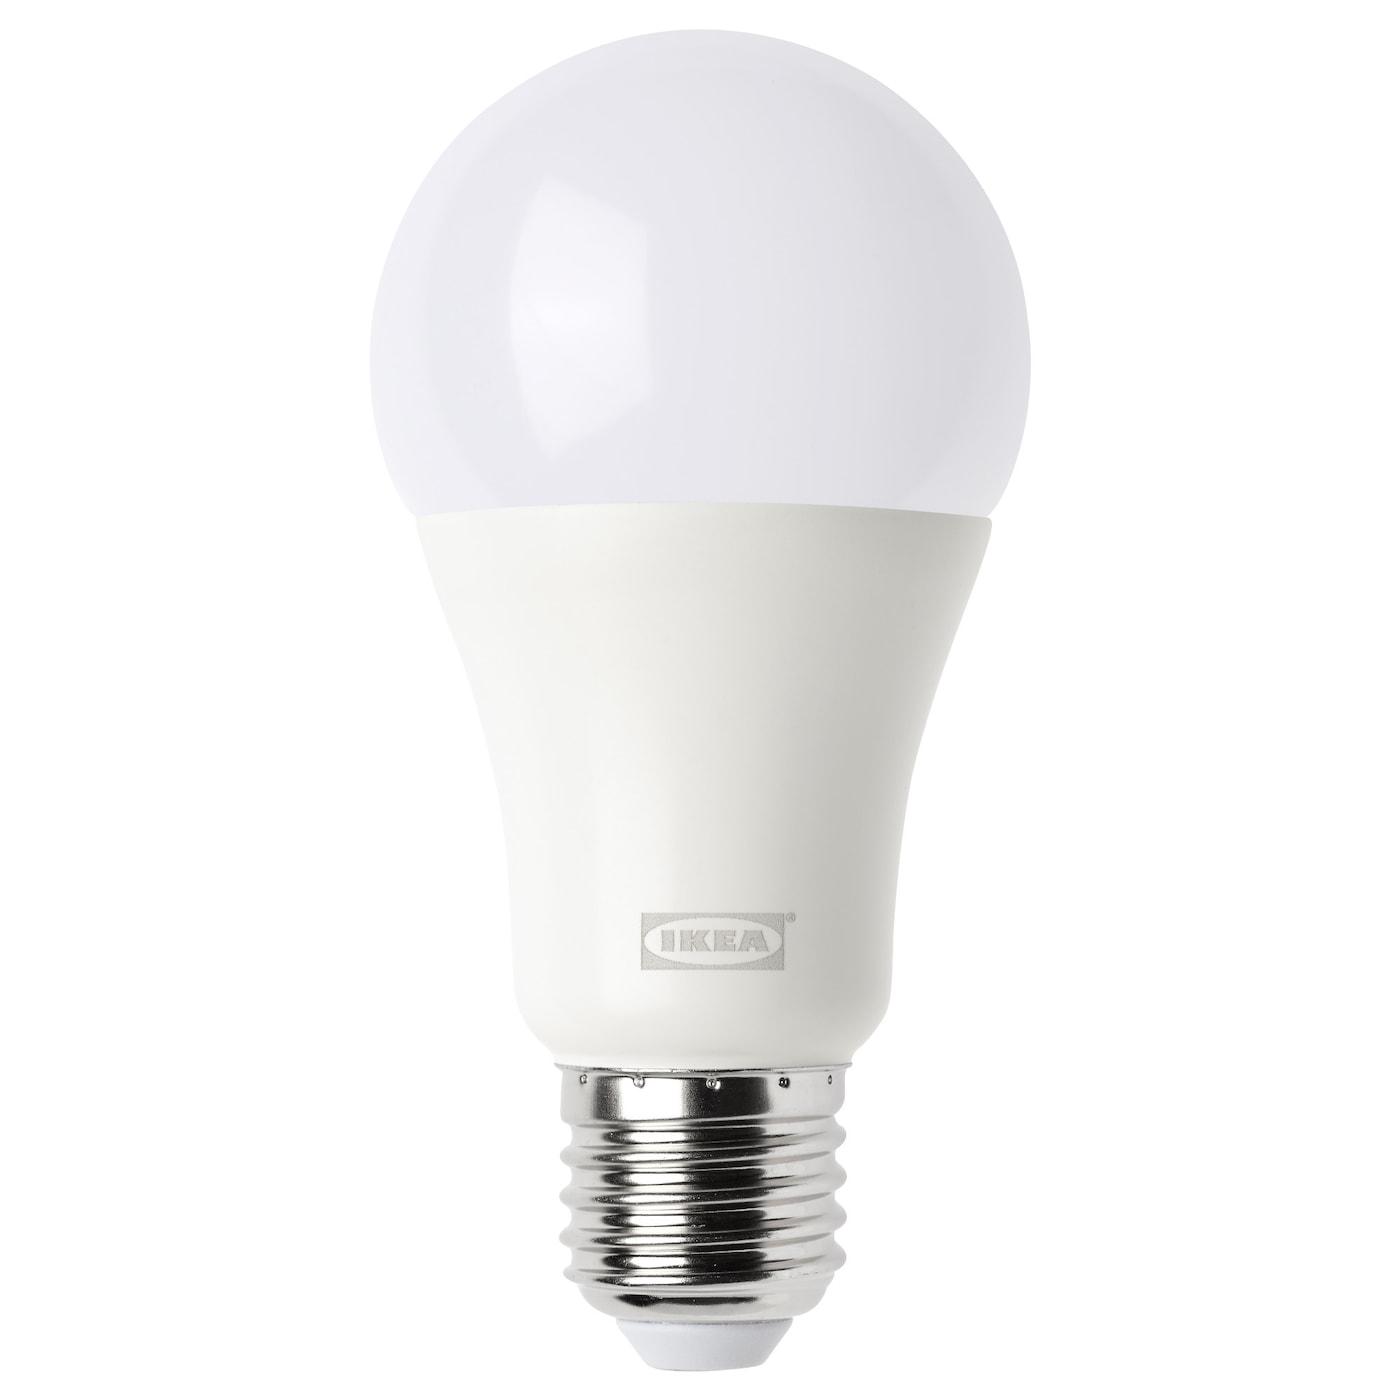 RYET LED-Lampe E27 600 lm - IKEA